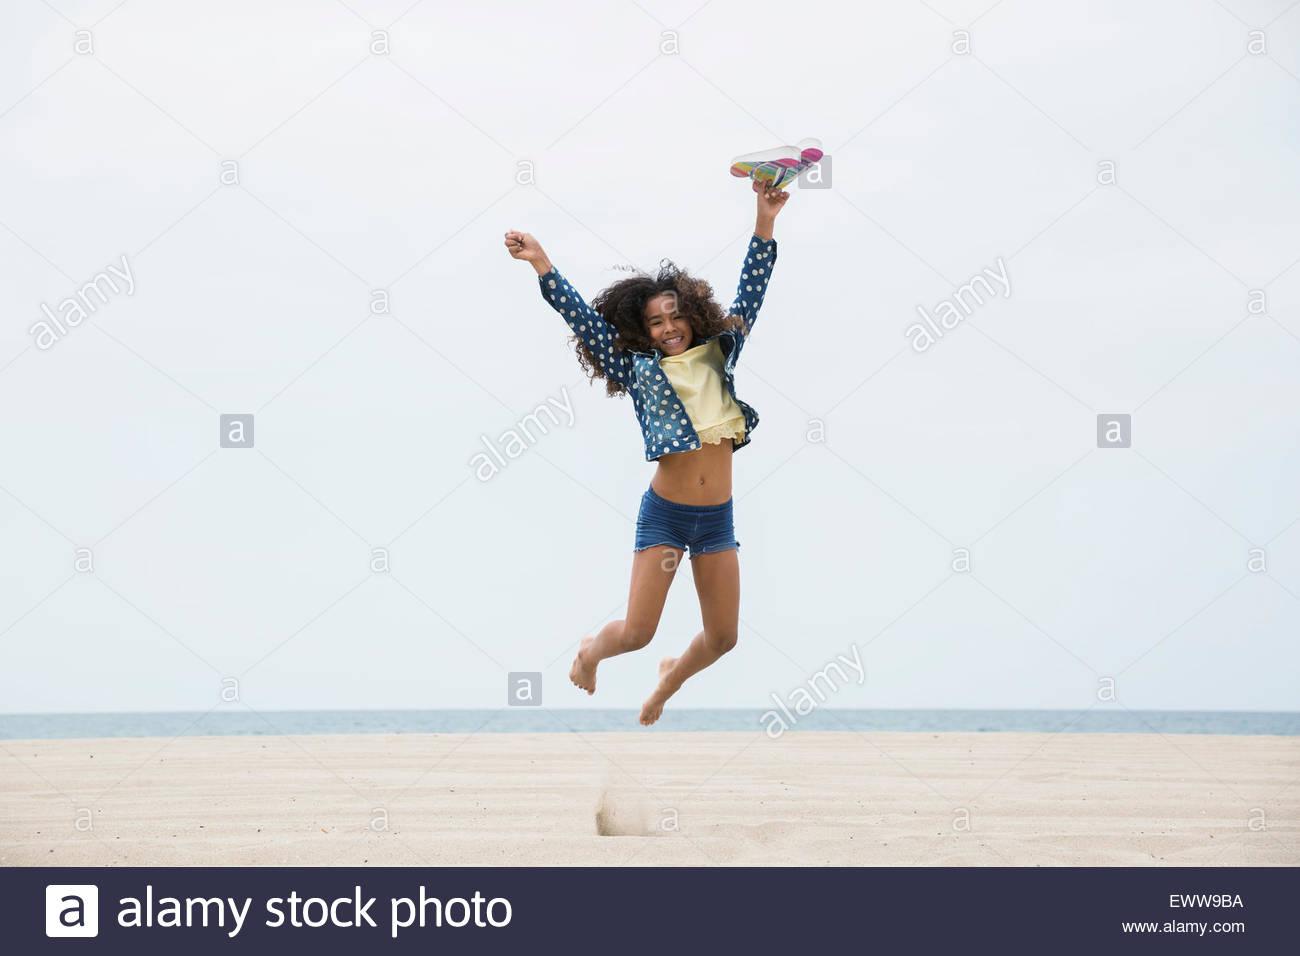 Portrait exuberant girl jumping on beach - Stock Image